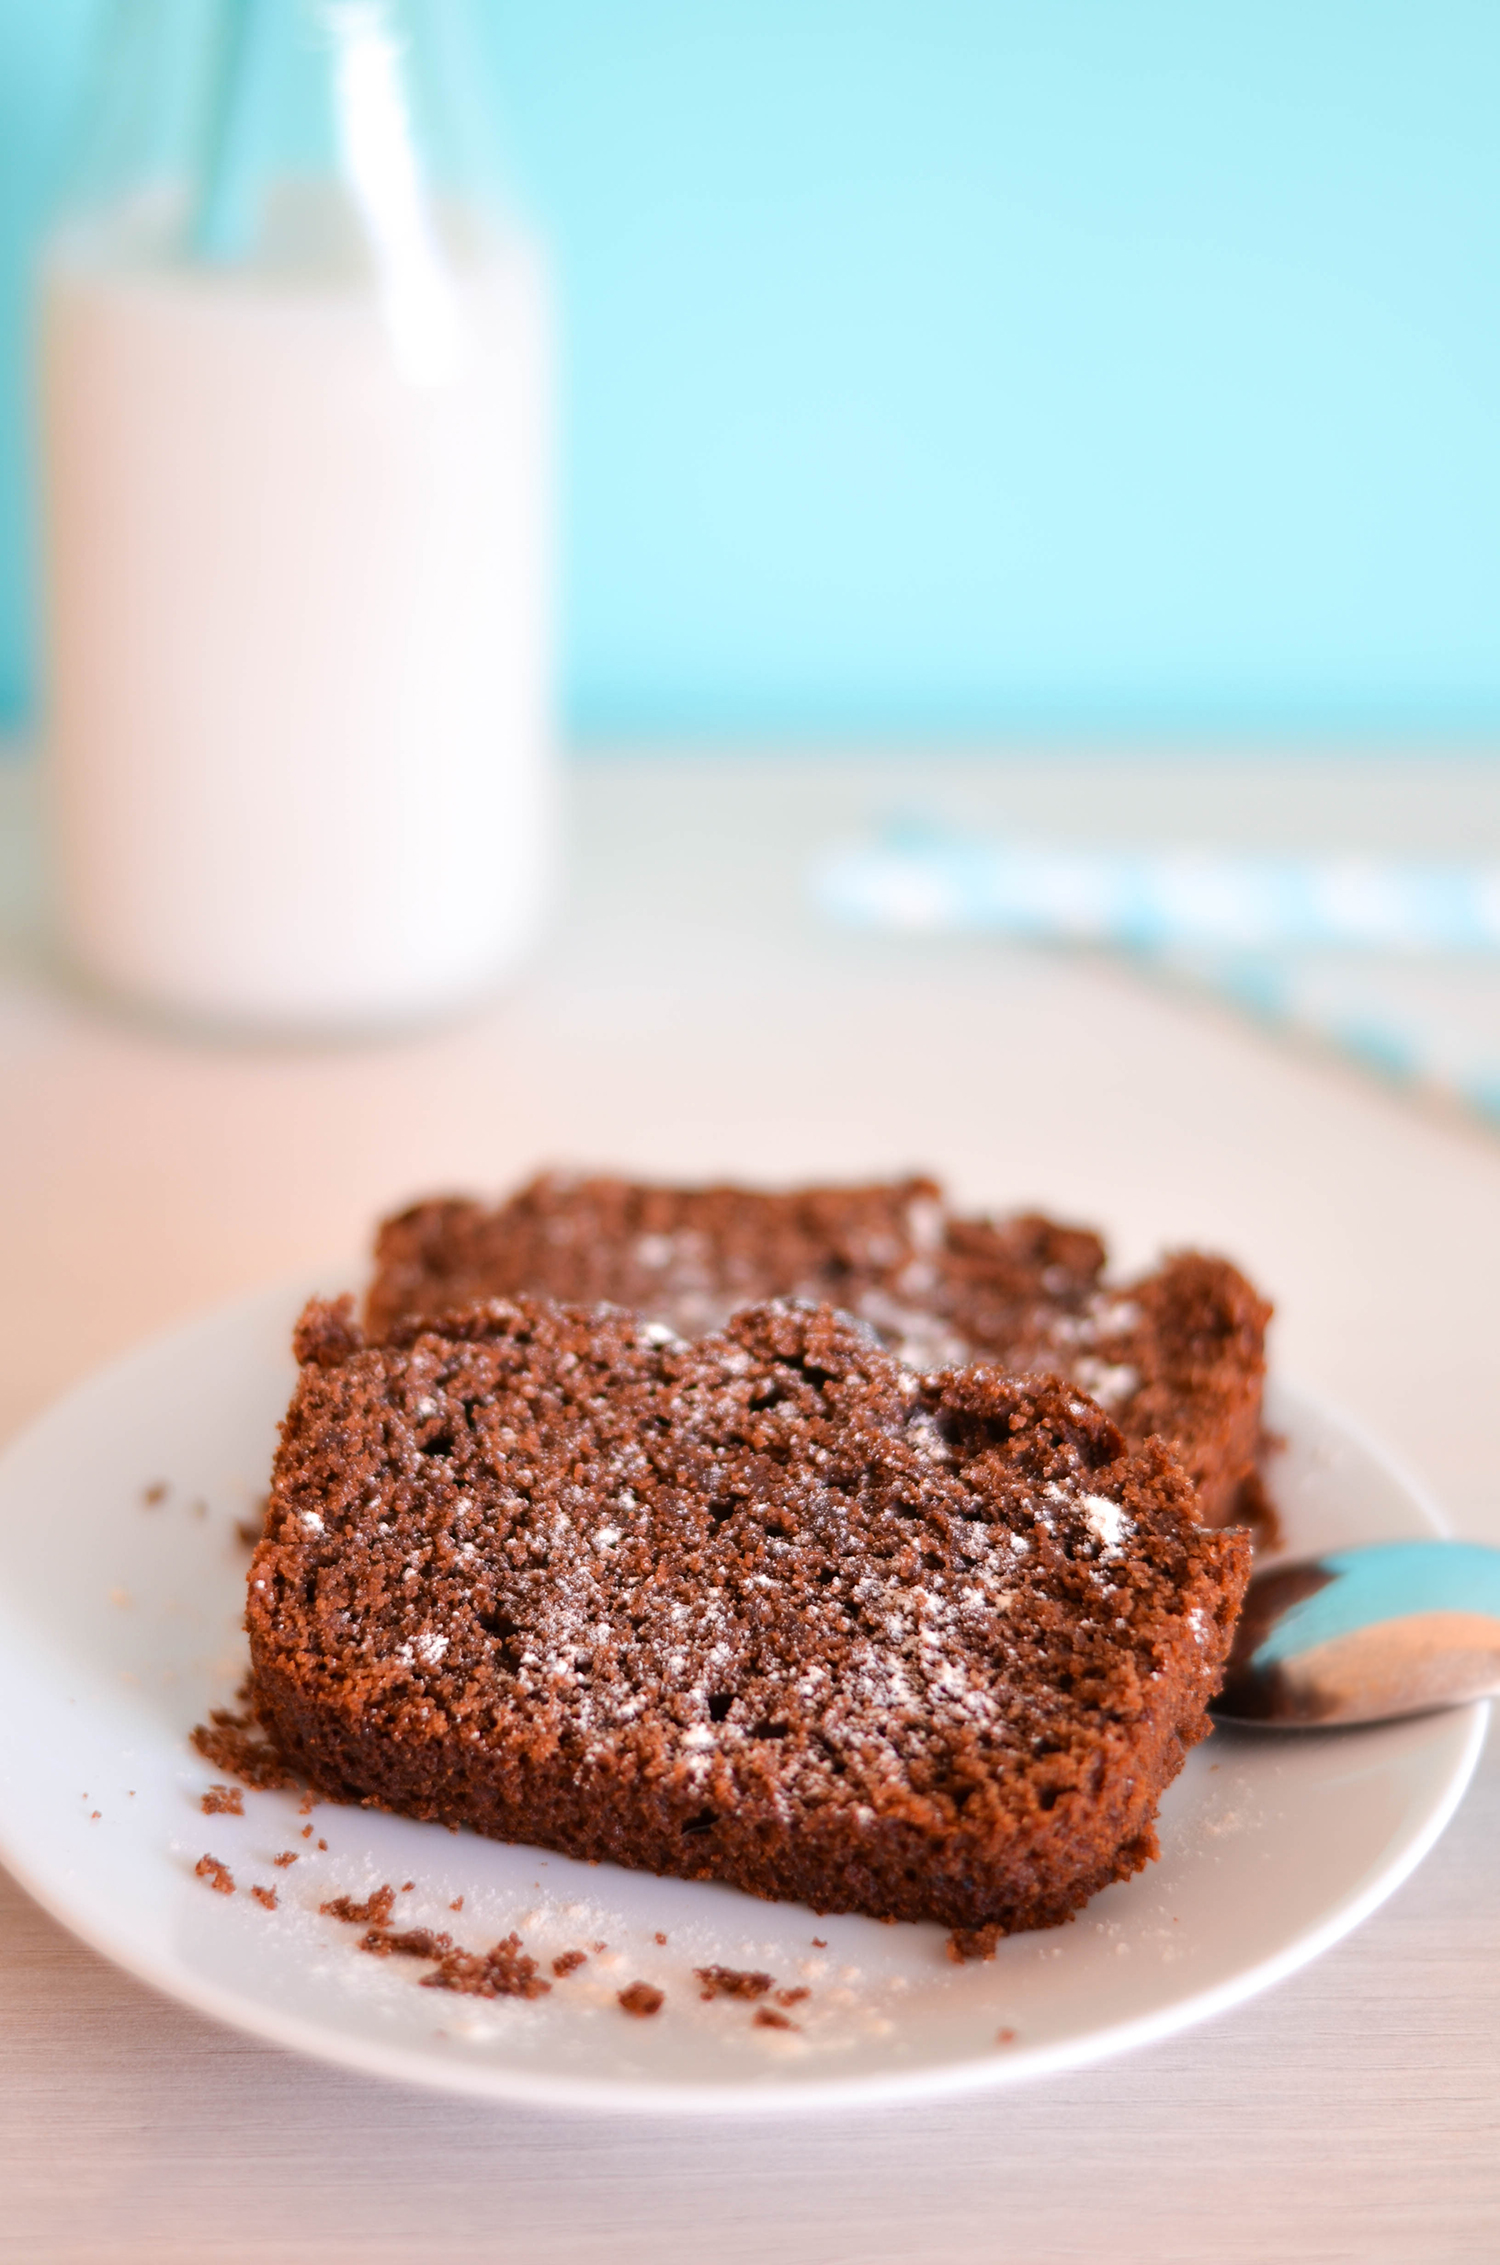 cake_chocolat_reconfortant_vegan_healthy_gluten_free_6